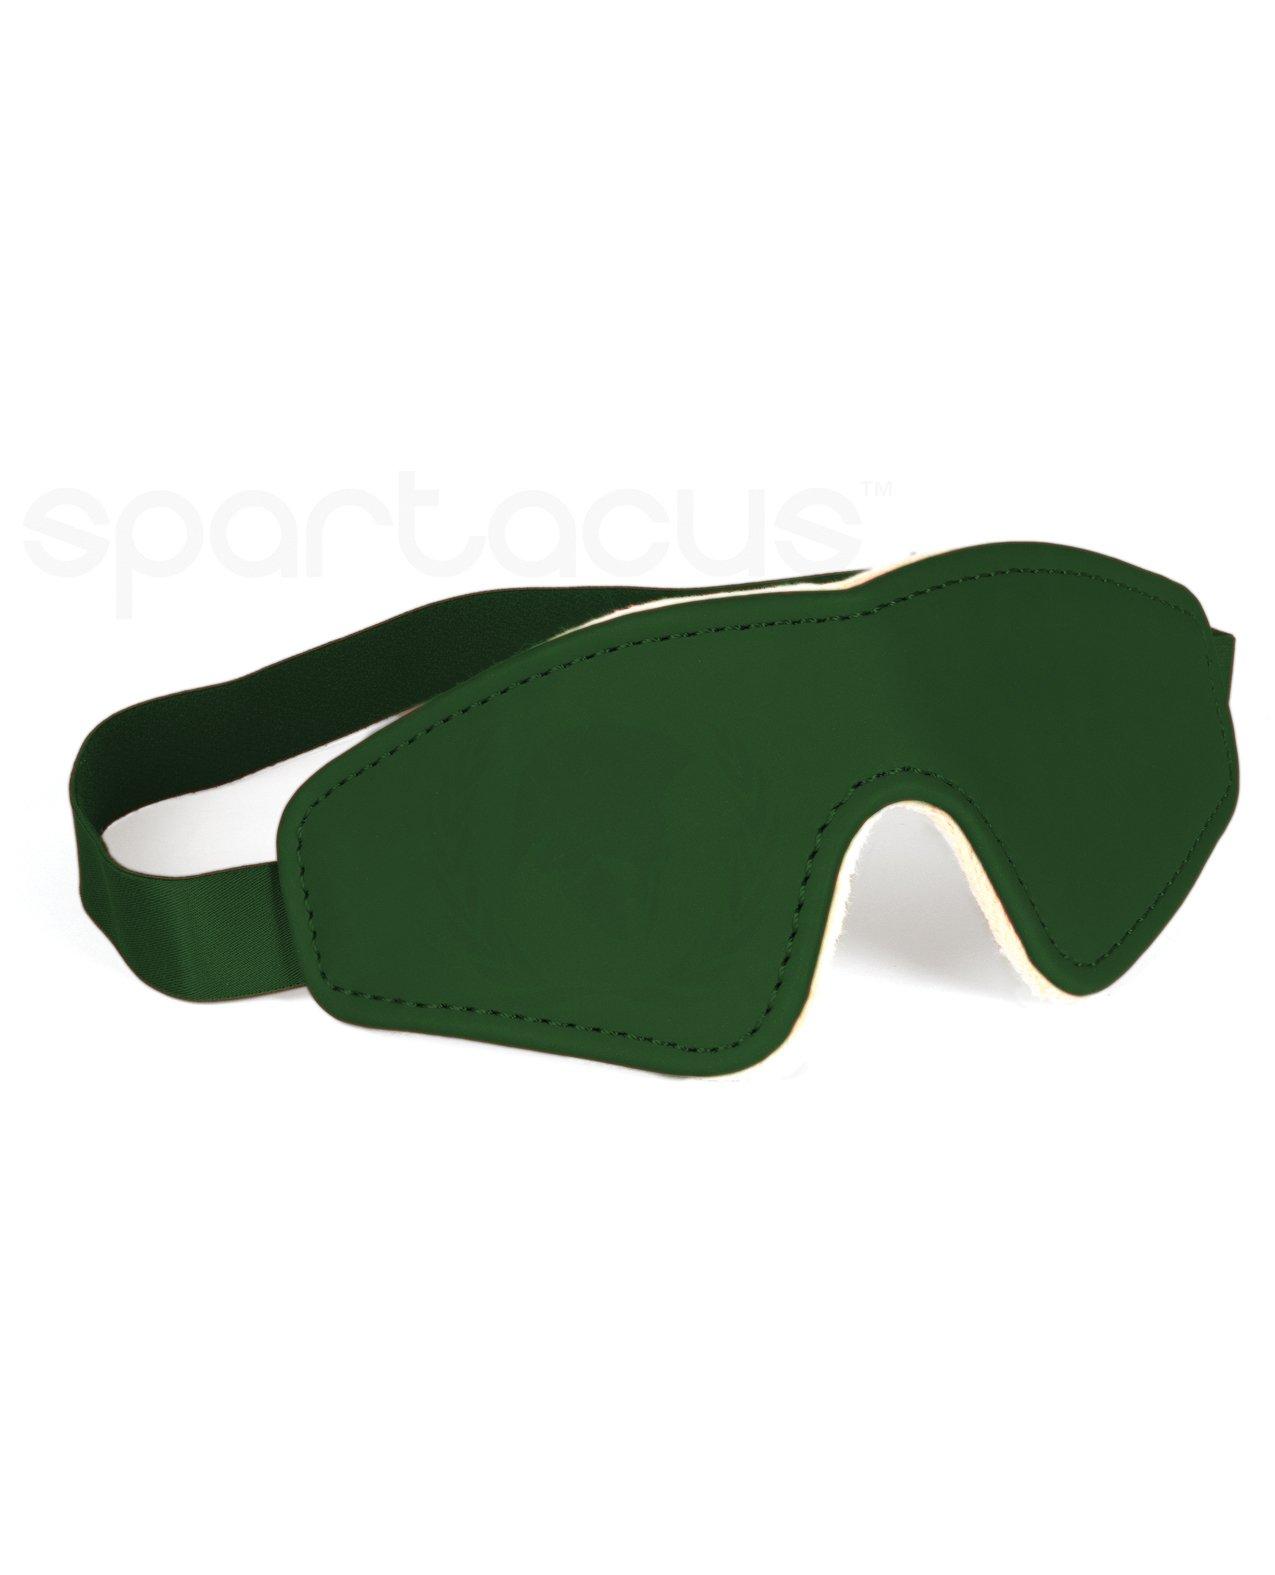 Spartacus PU Blindfold w/Plush Lining